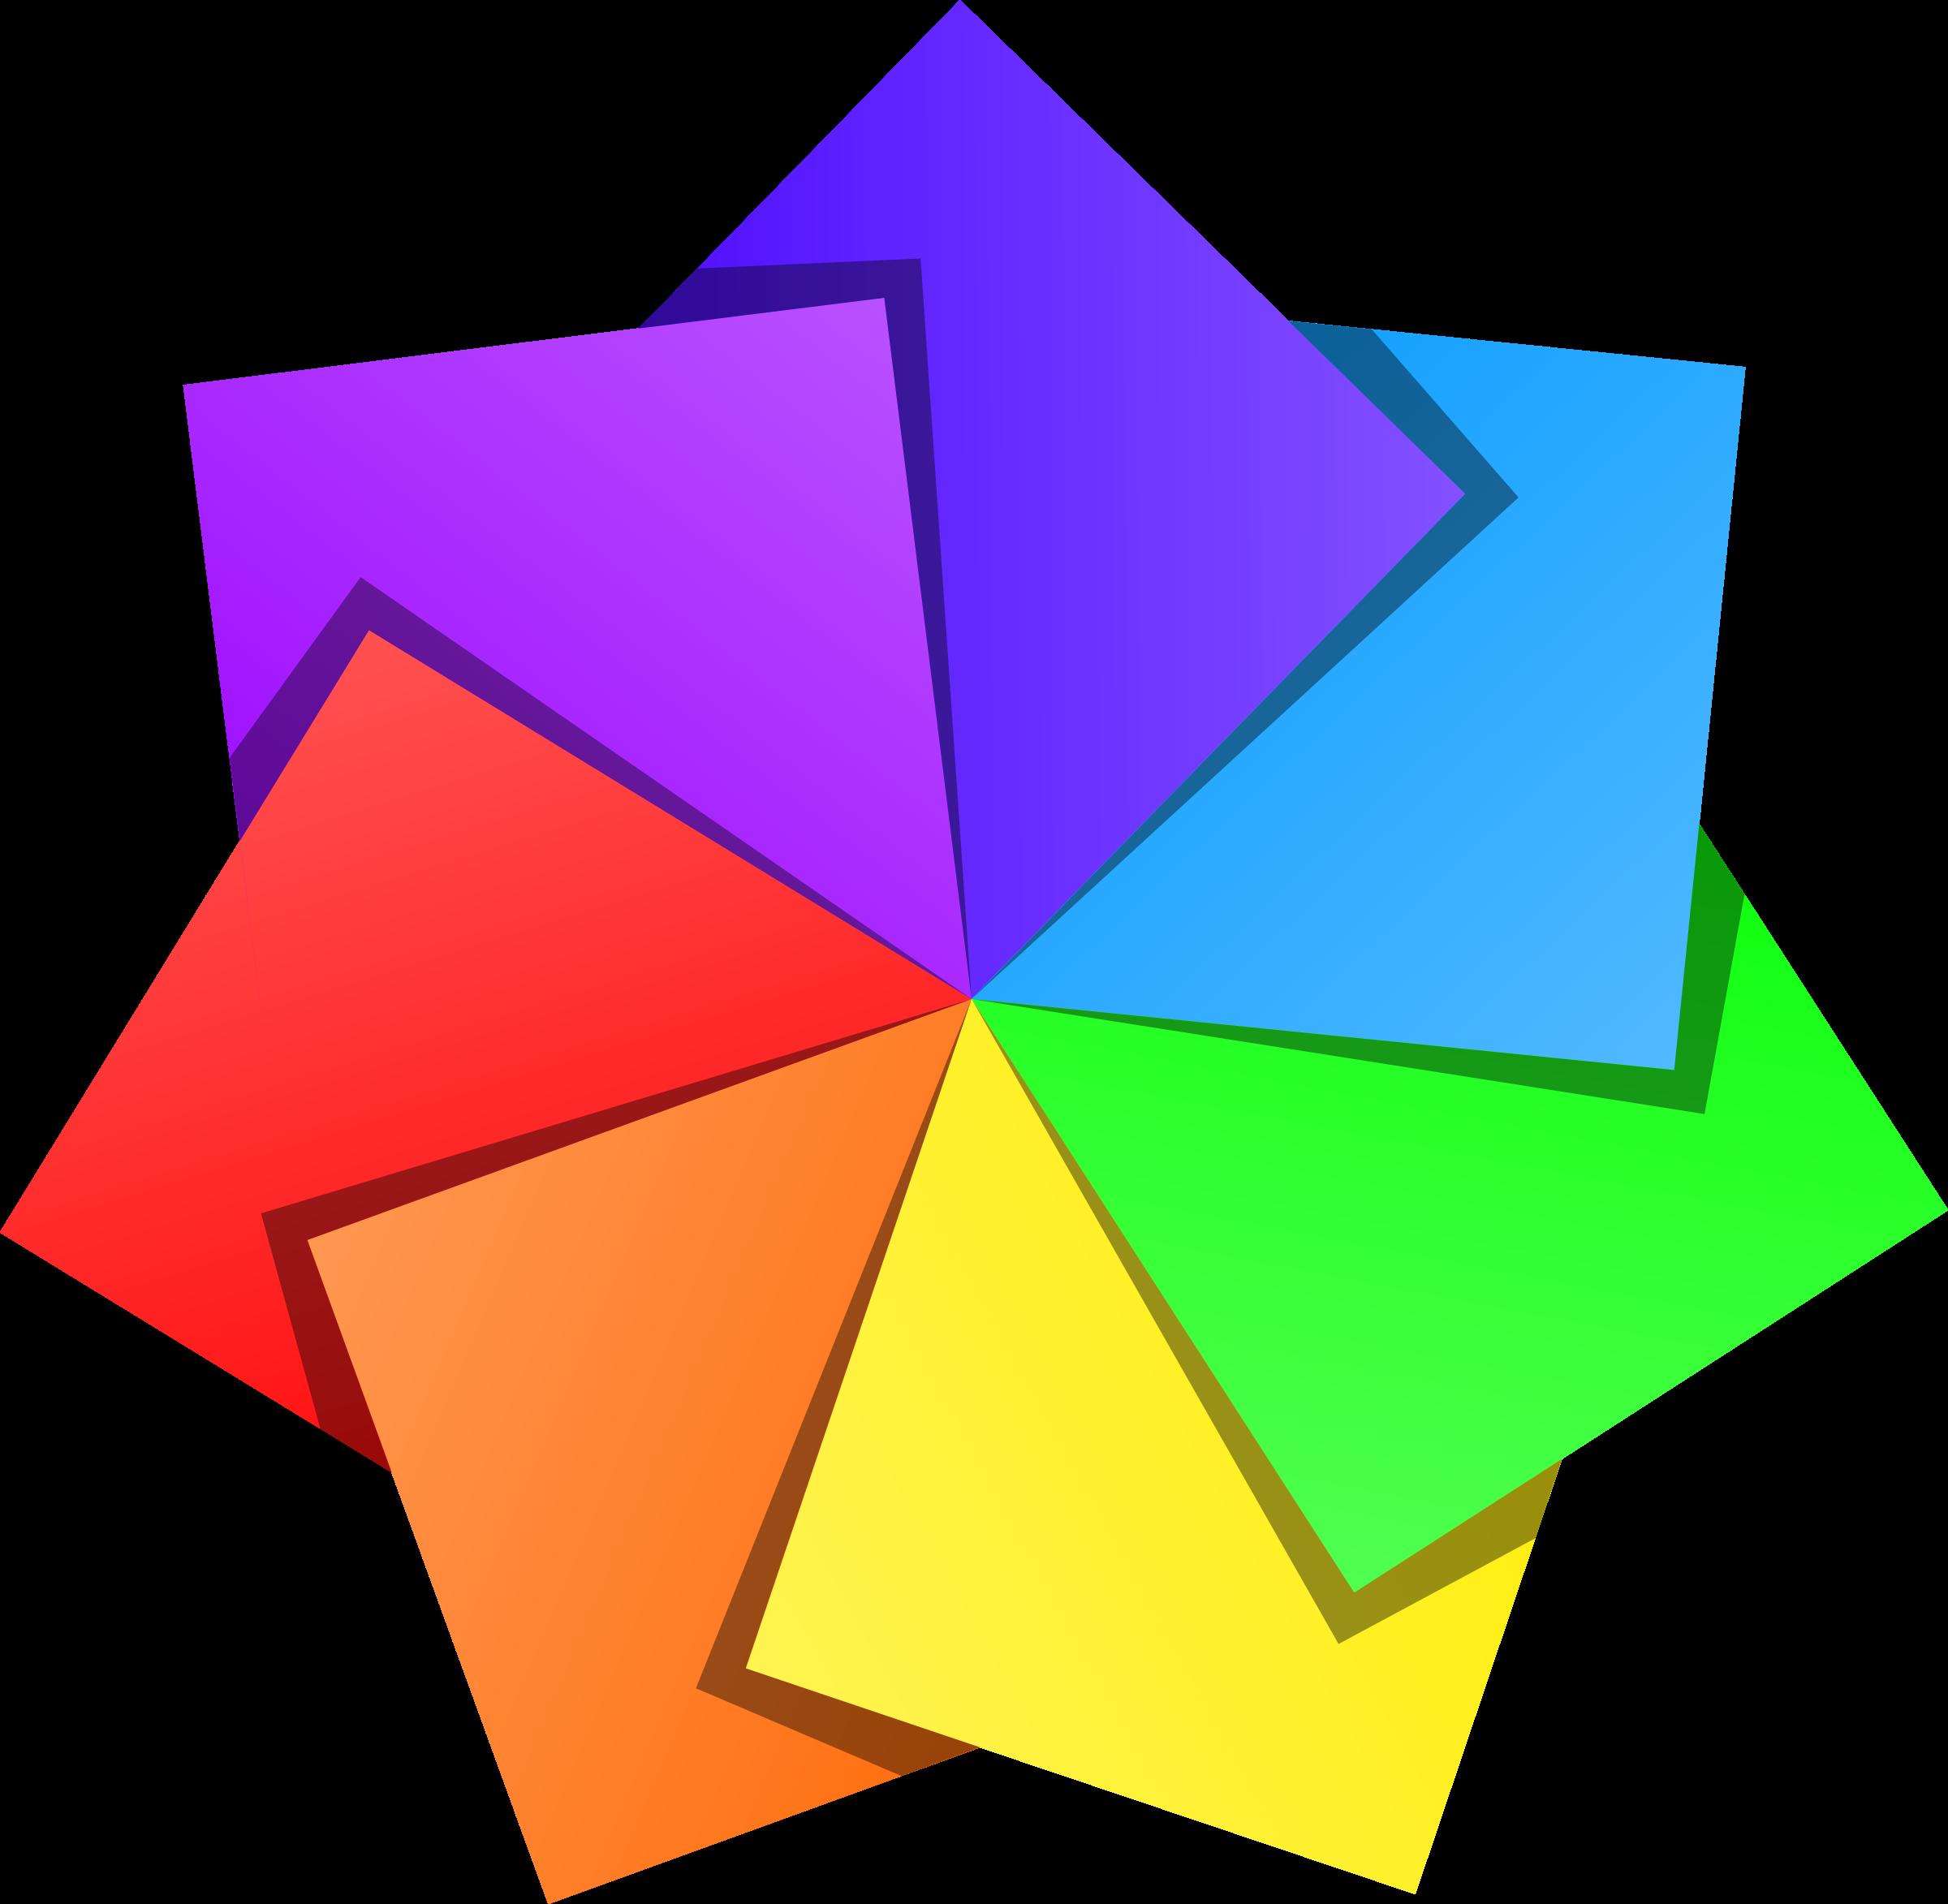 Colors clipart basic. Color star big image